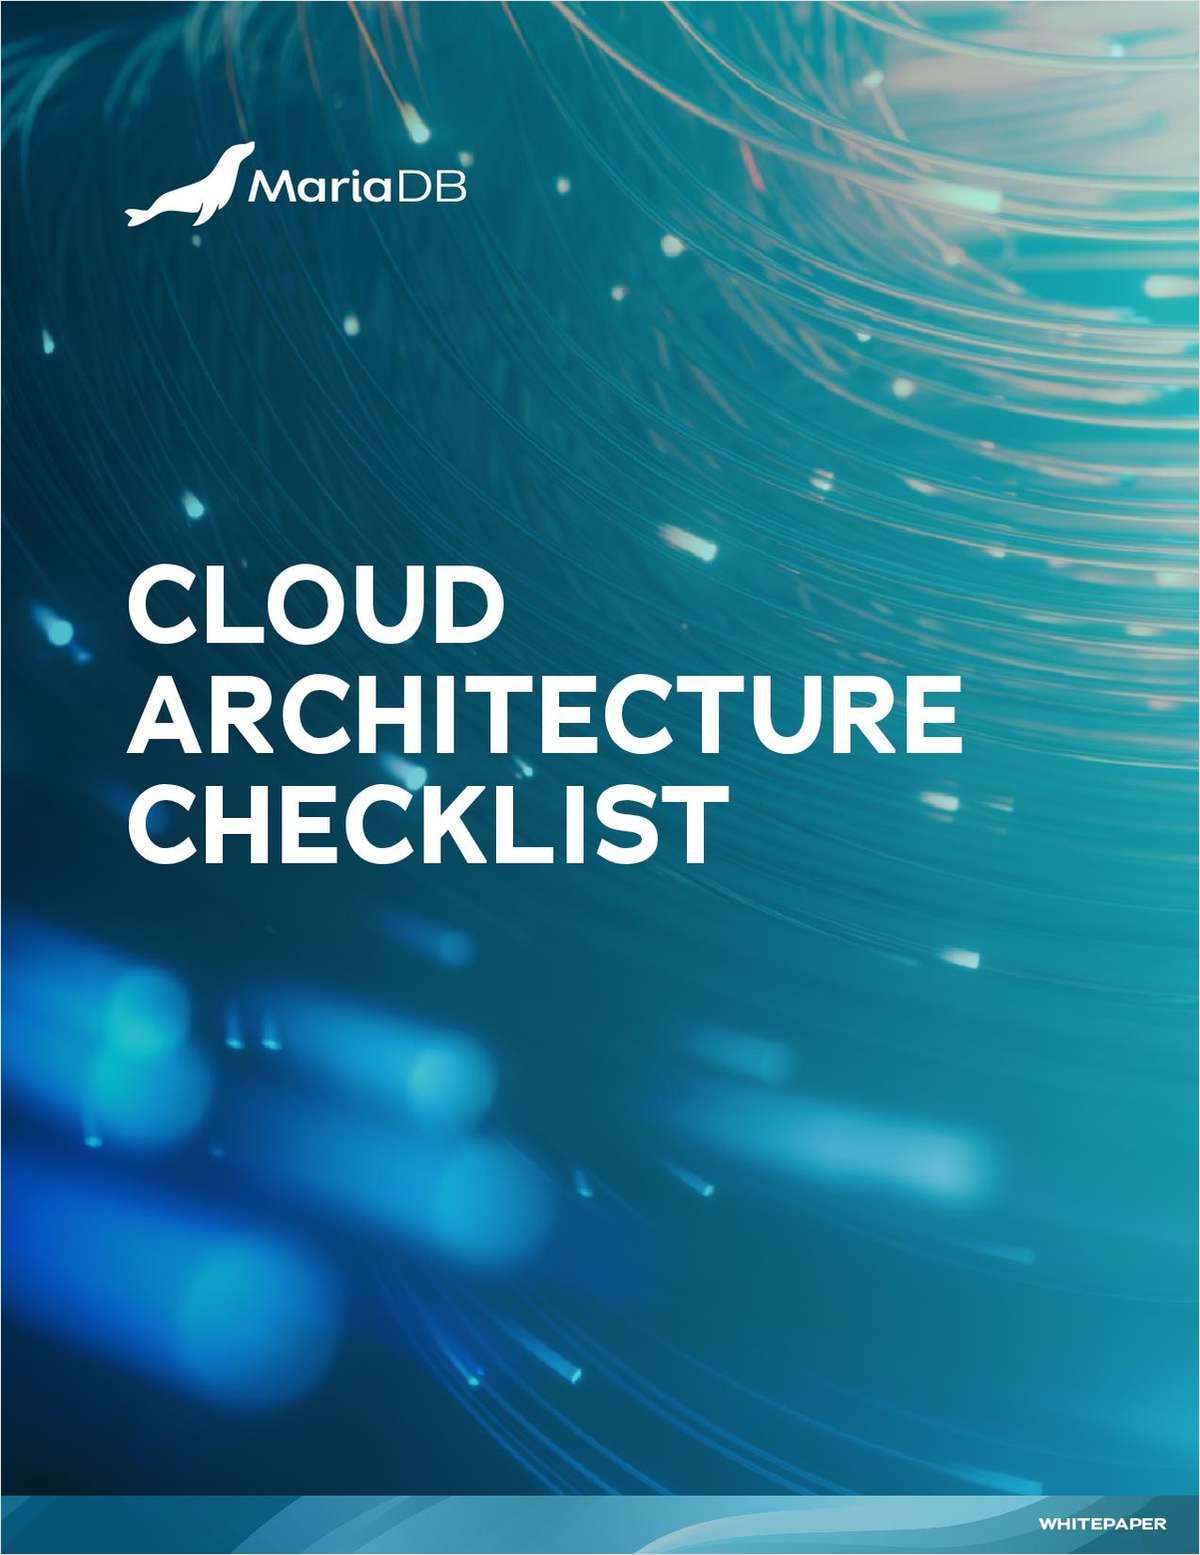 Cloud Architecture Checklist